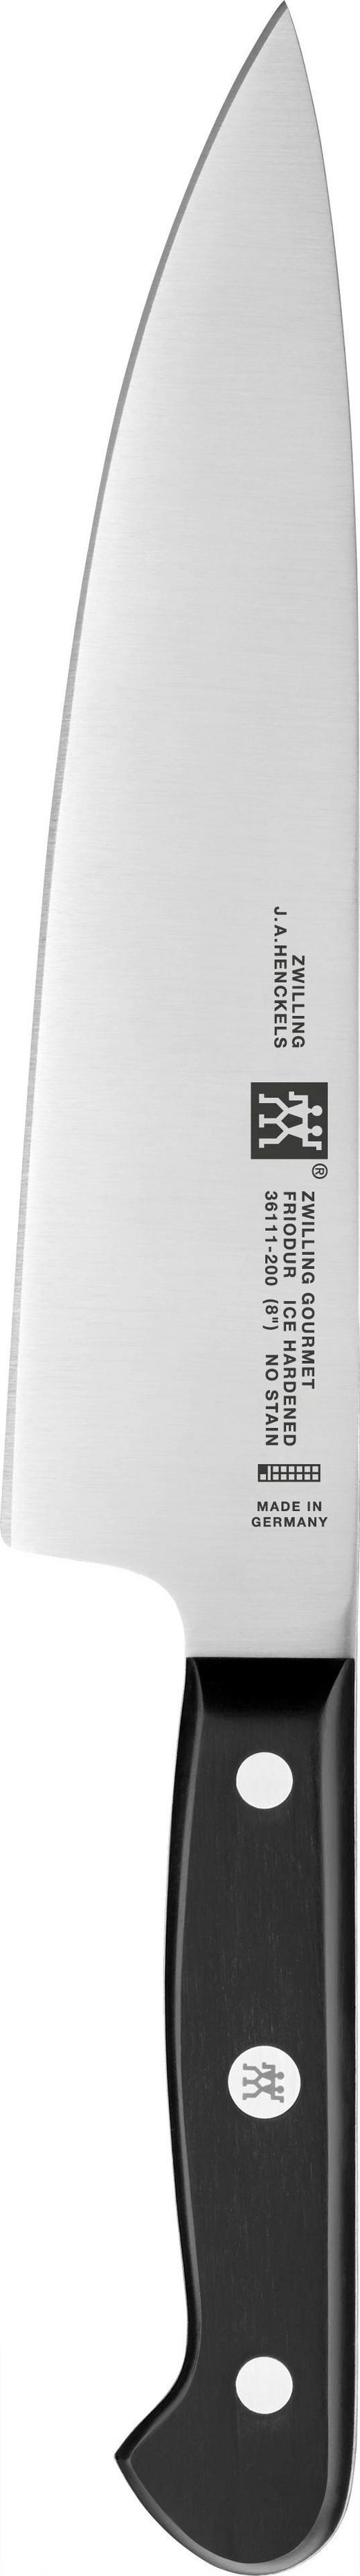 KOCHMESSER - Silberfarben/Schwarz, Basics, Kunststoff/Metall - Zwilling